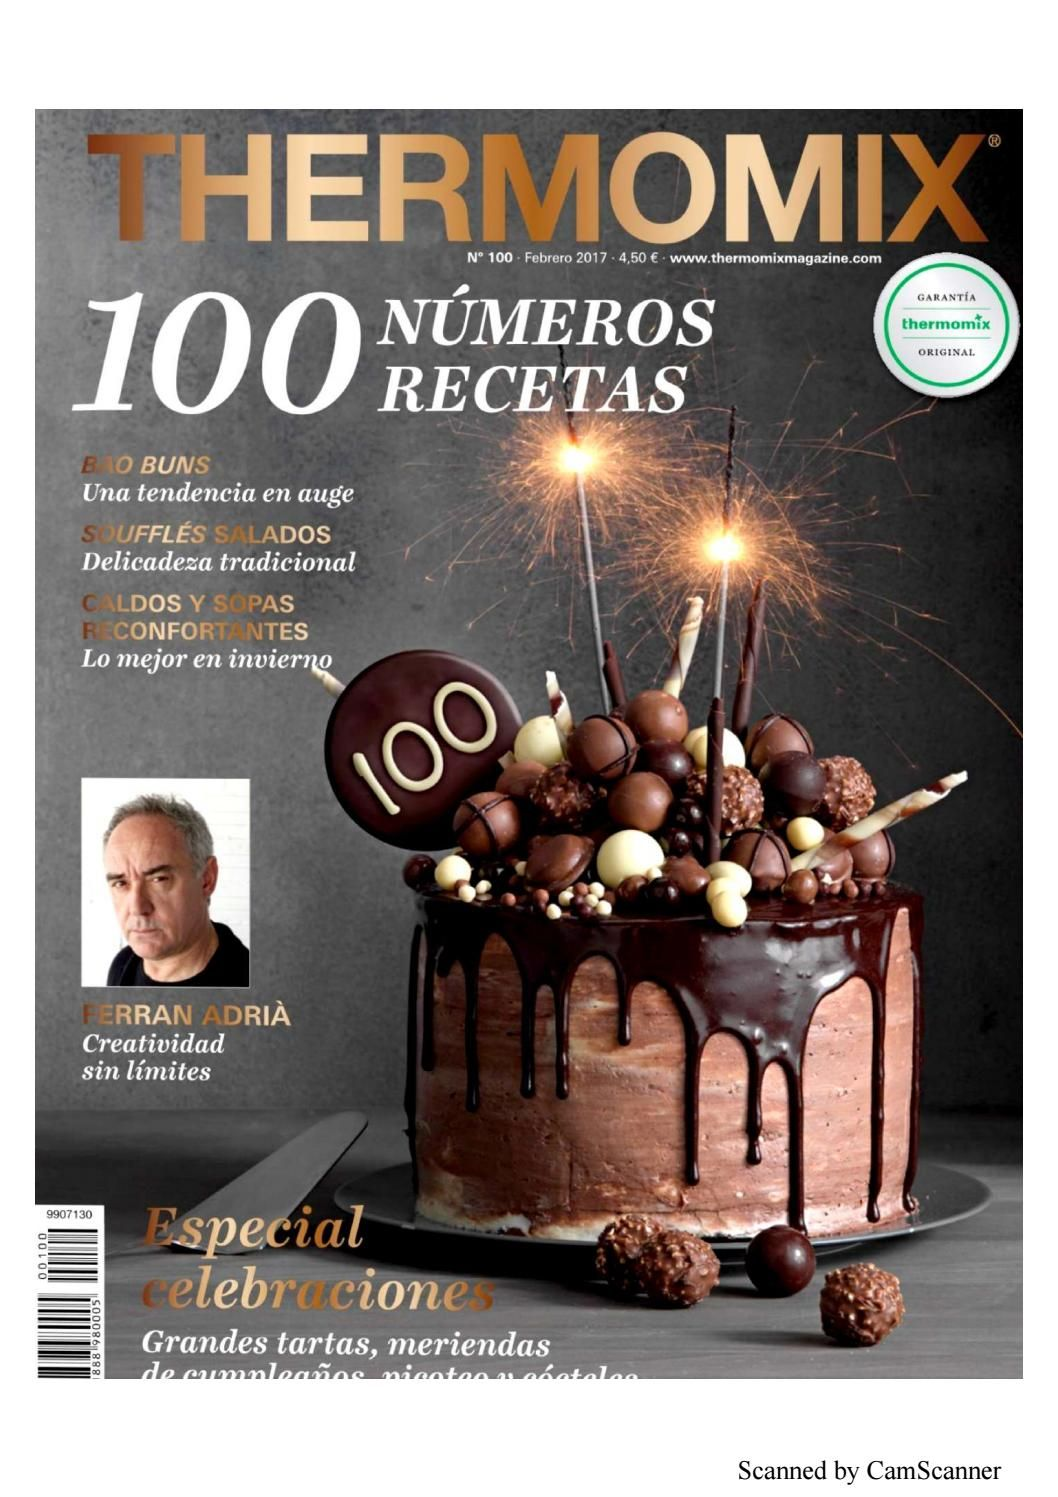 Thermomix Magazine Nº 100 Febrero 2017 Thermomix Thermomix Desserts Thermomix Recipes